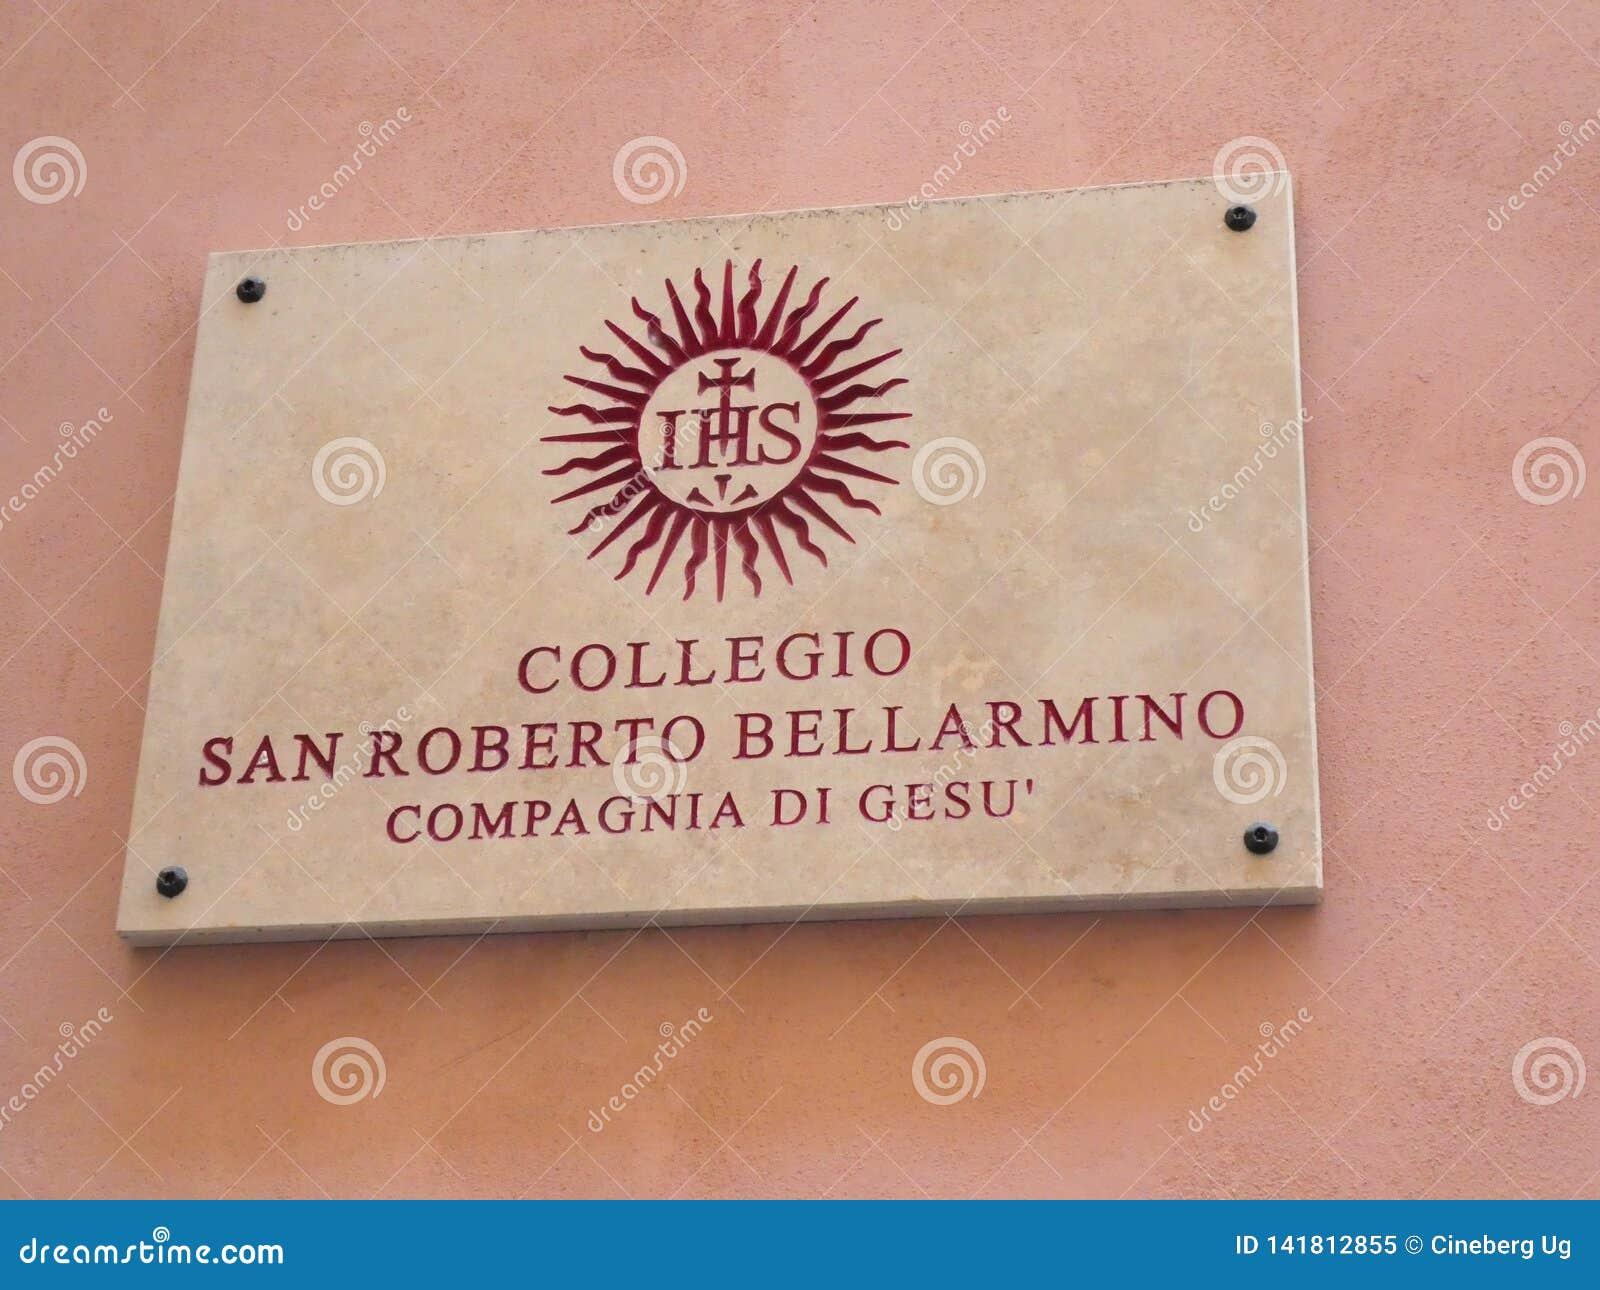 Collegio San Roberto Bellarmino